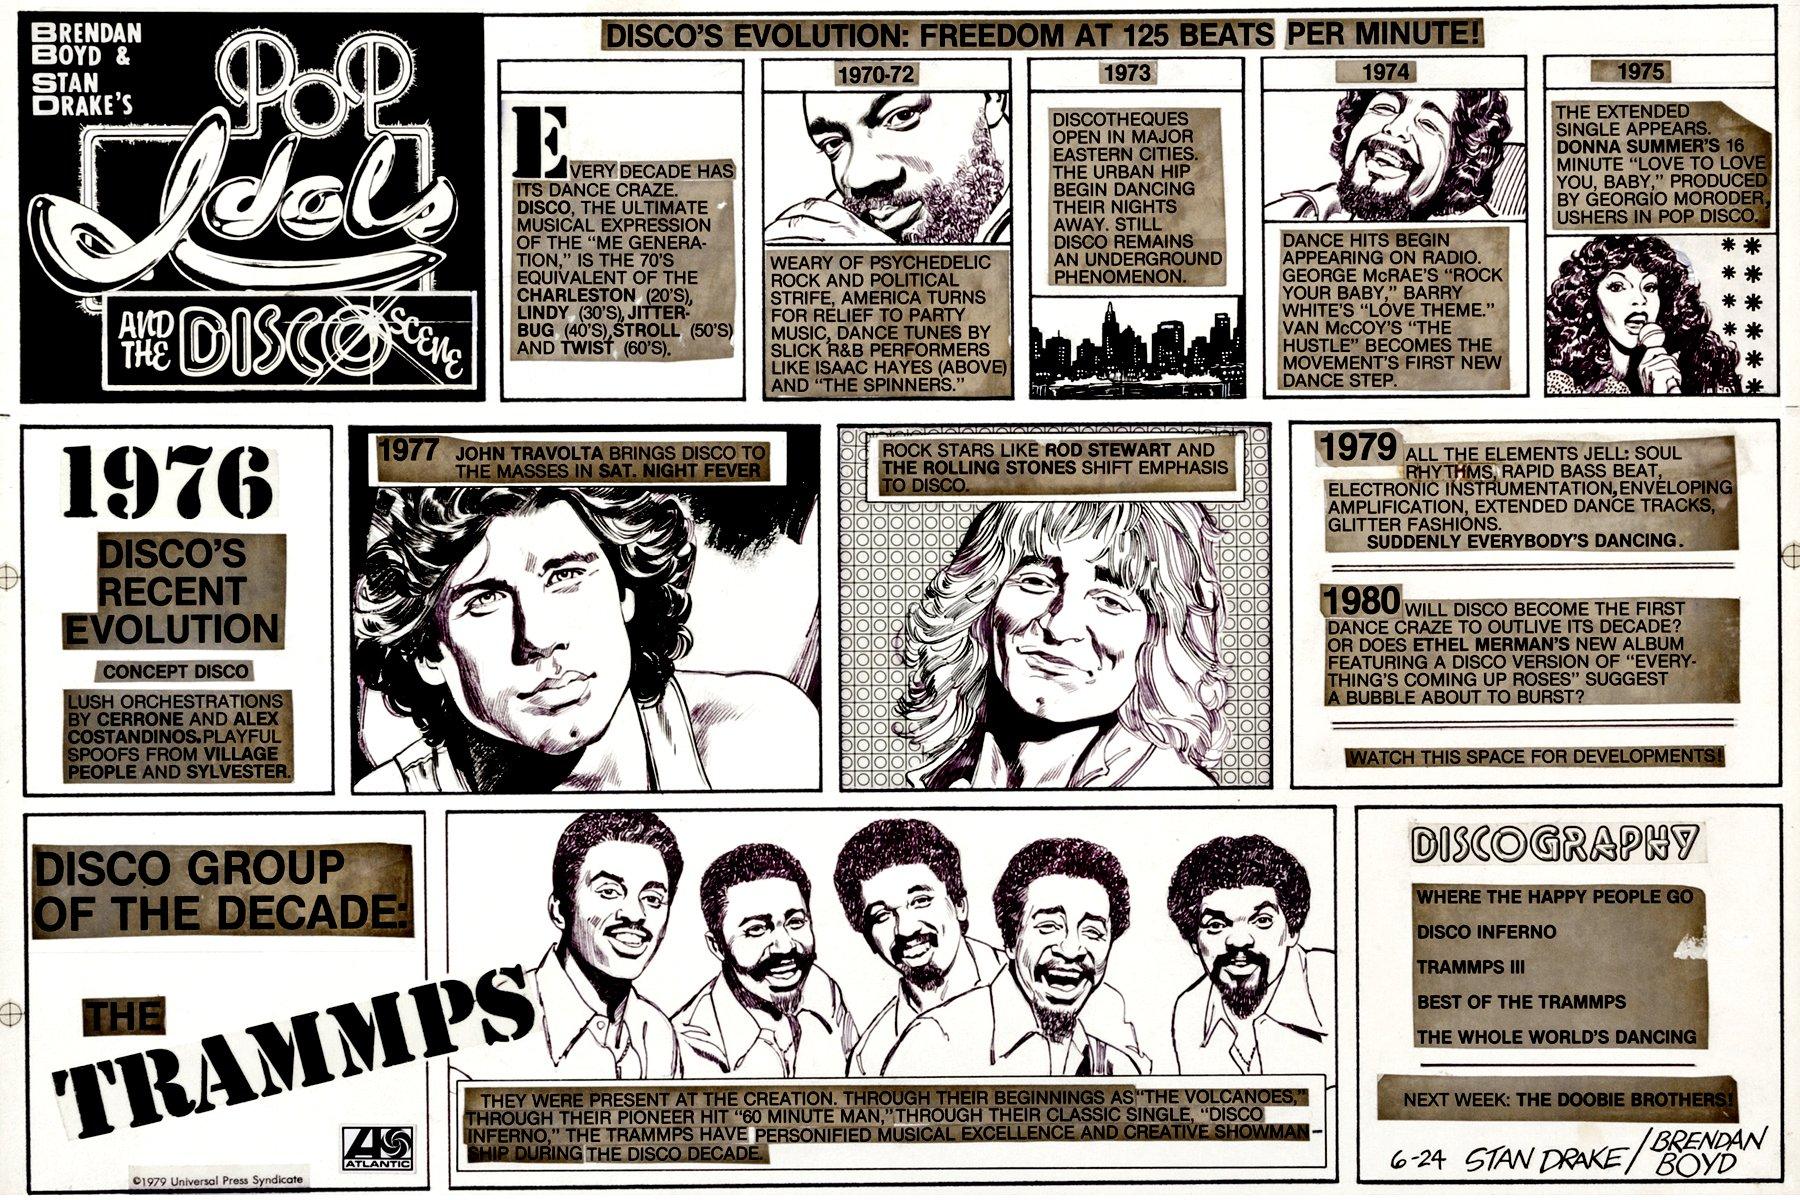 Pop Idols and the Disco Scene Very Large Sunday Strip (6-24-1979)